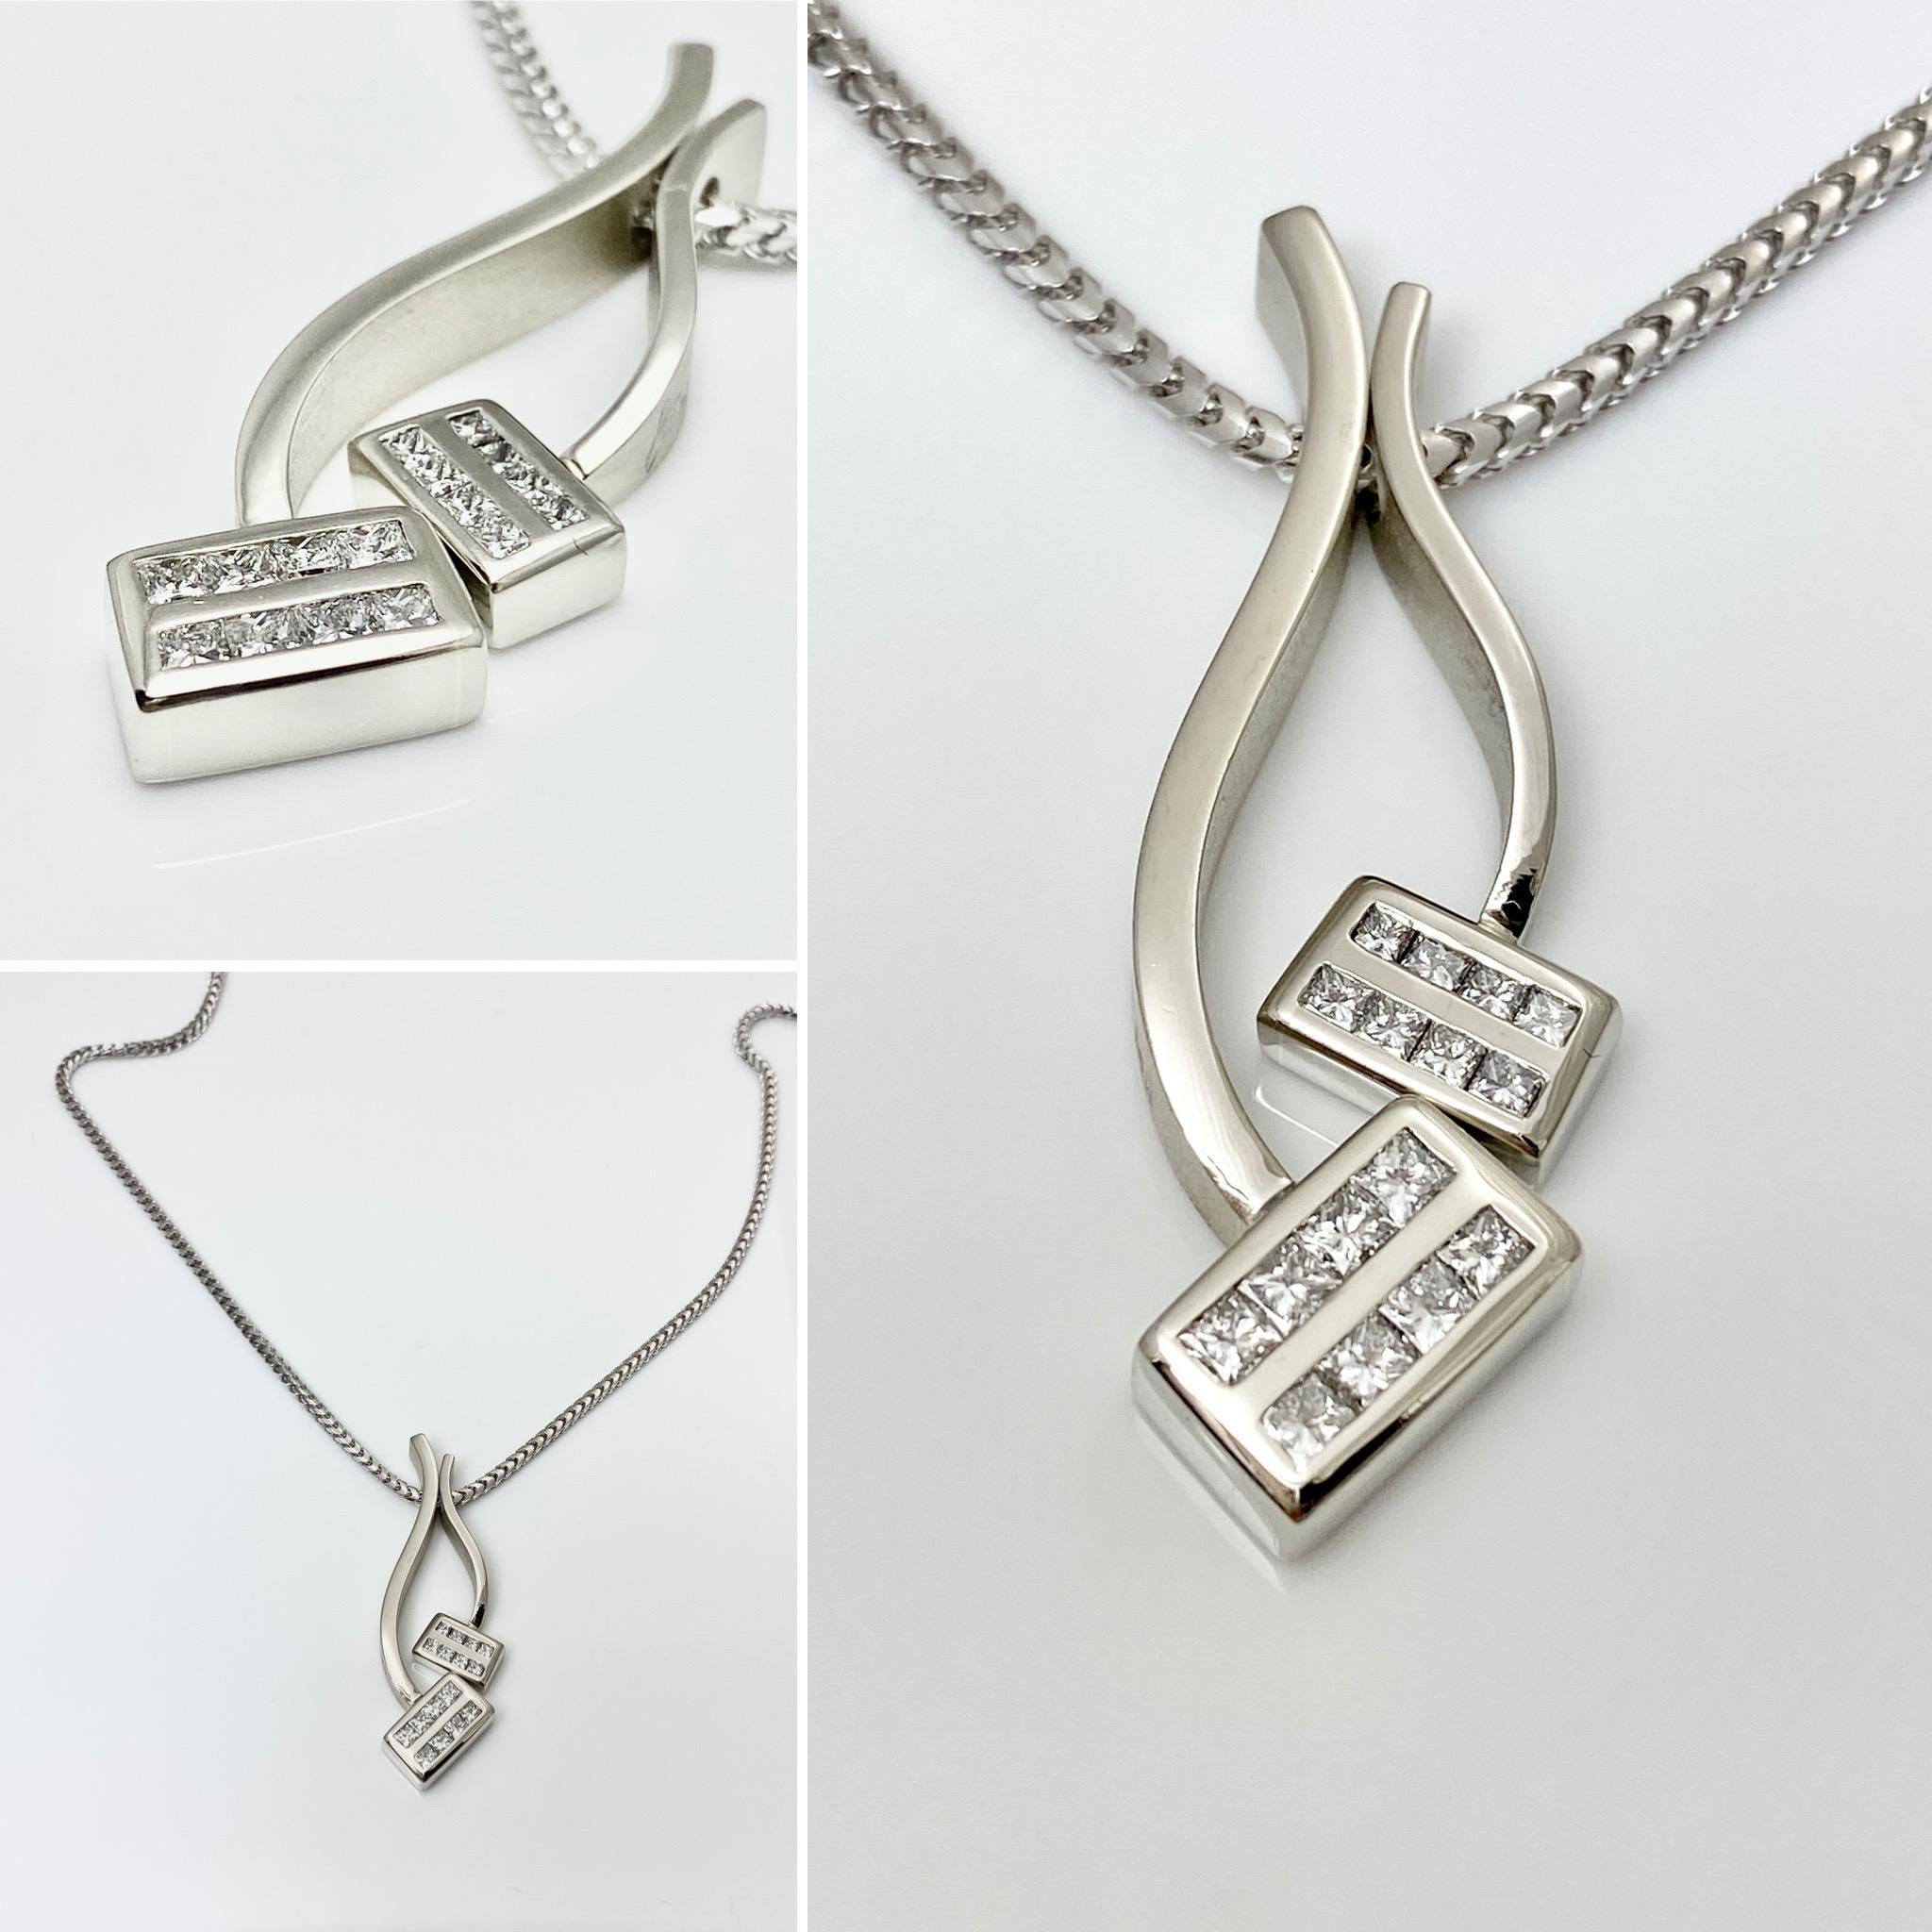 Asymmetrical Balance pendants, in two diamond pendants